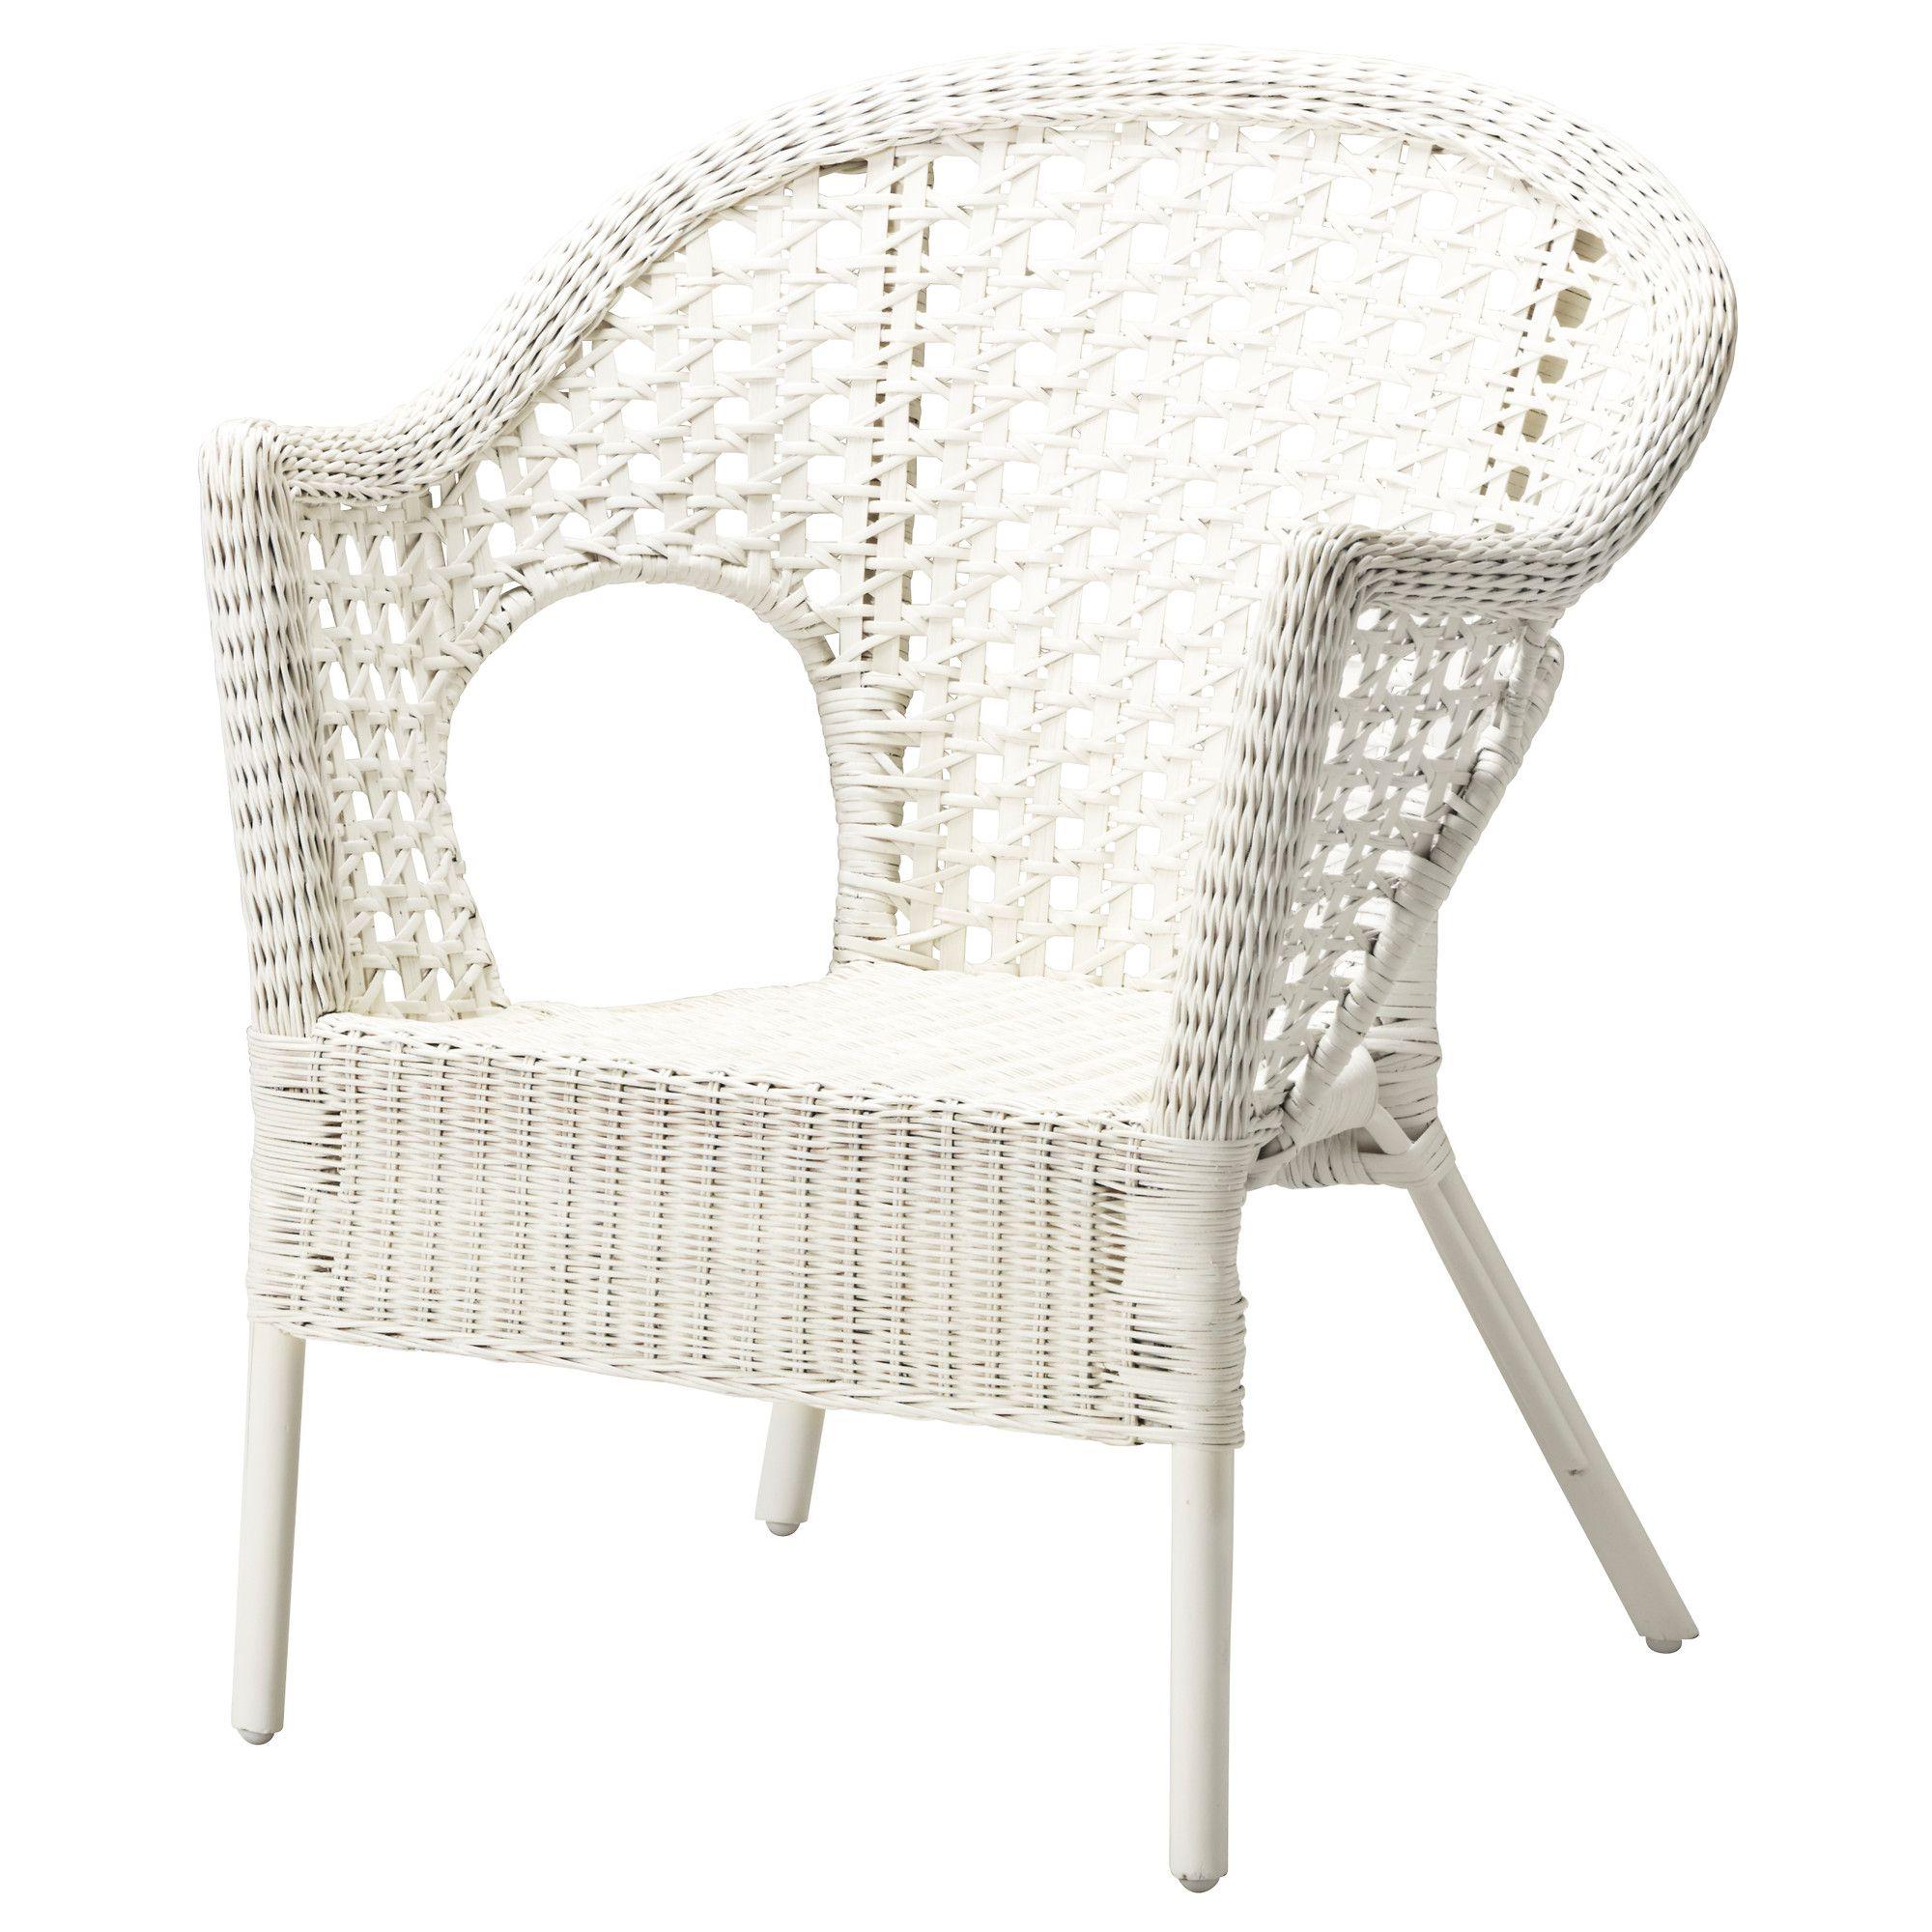 Us Furniture And Home Furnishings Cadeiras De Vime Poltronas